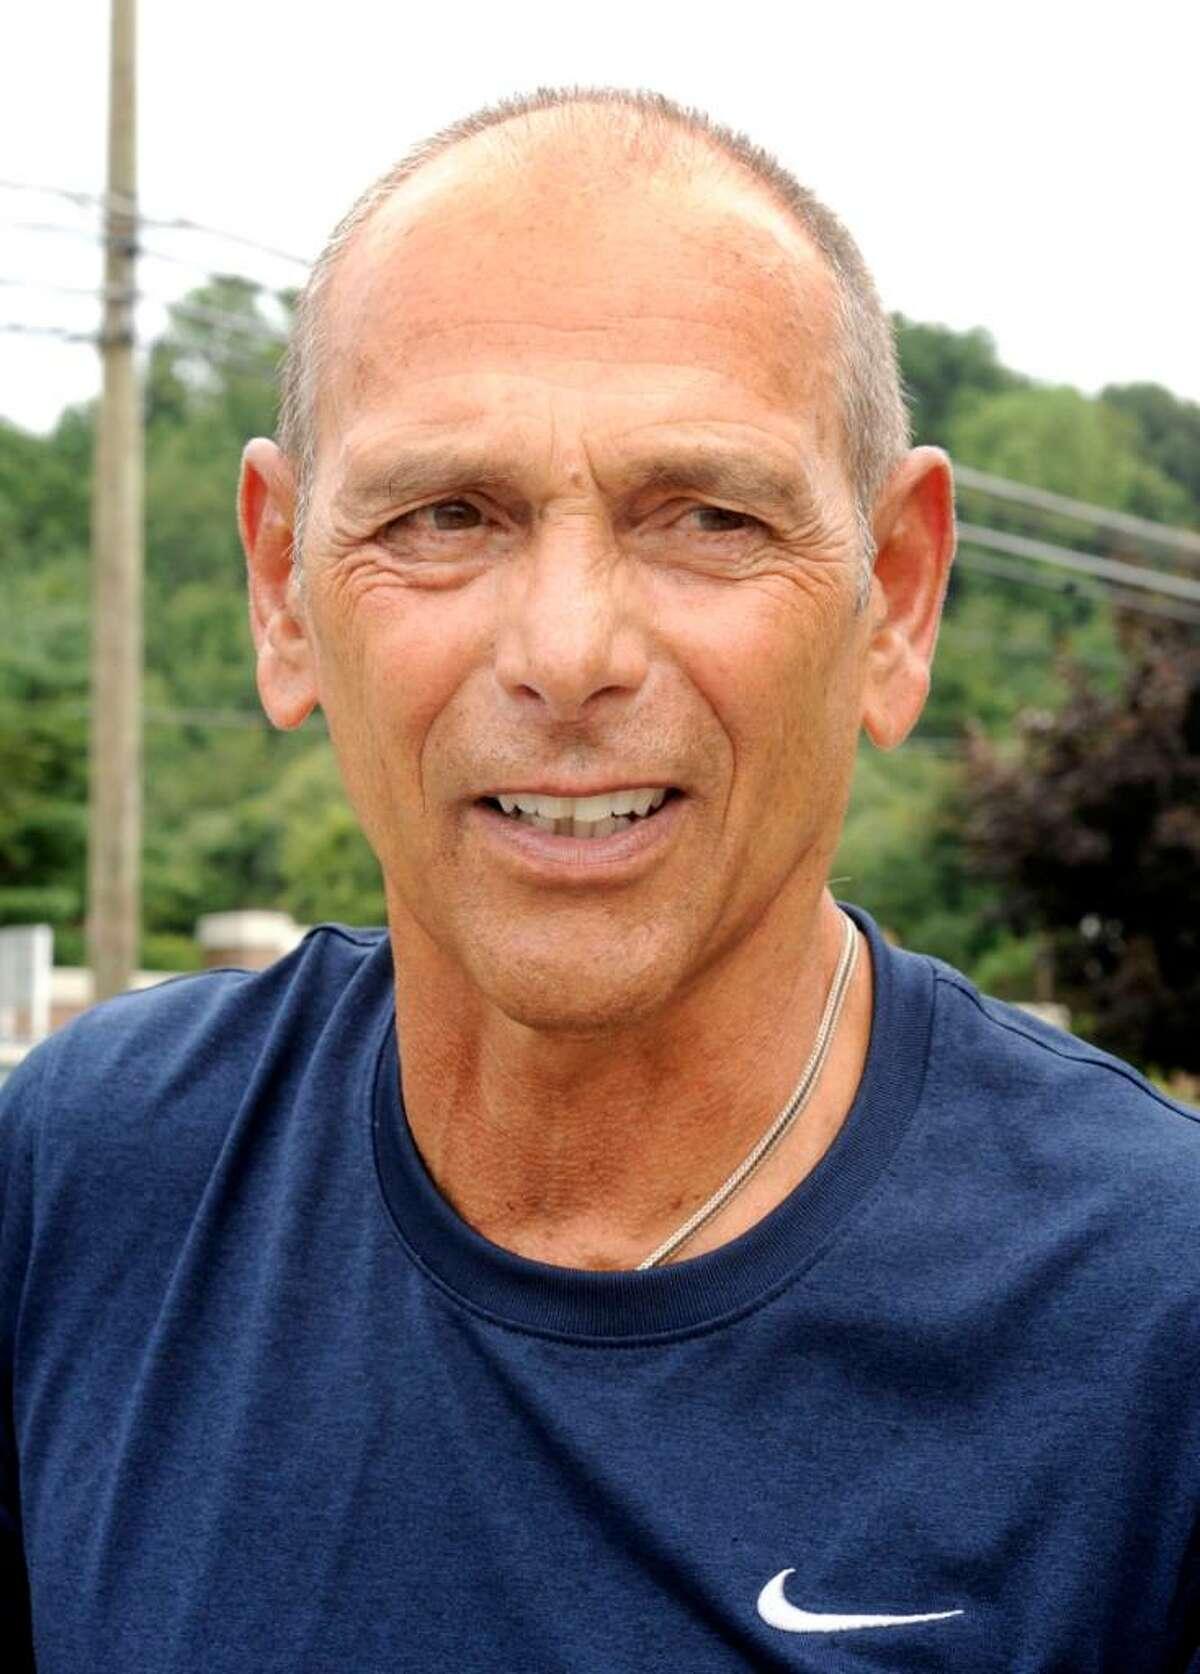 Man on the street - Skip DiLauro of New Fairfield.